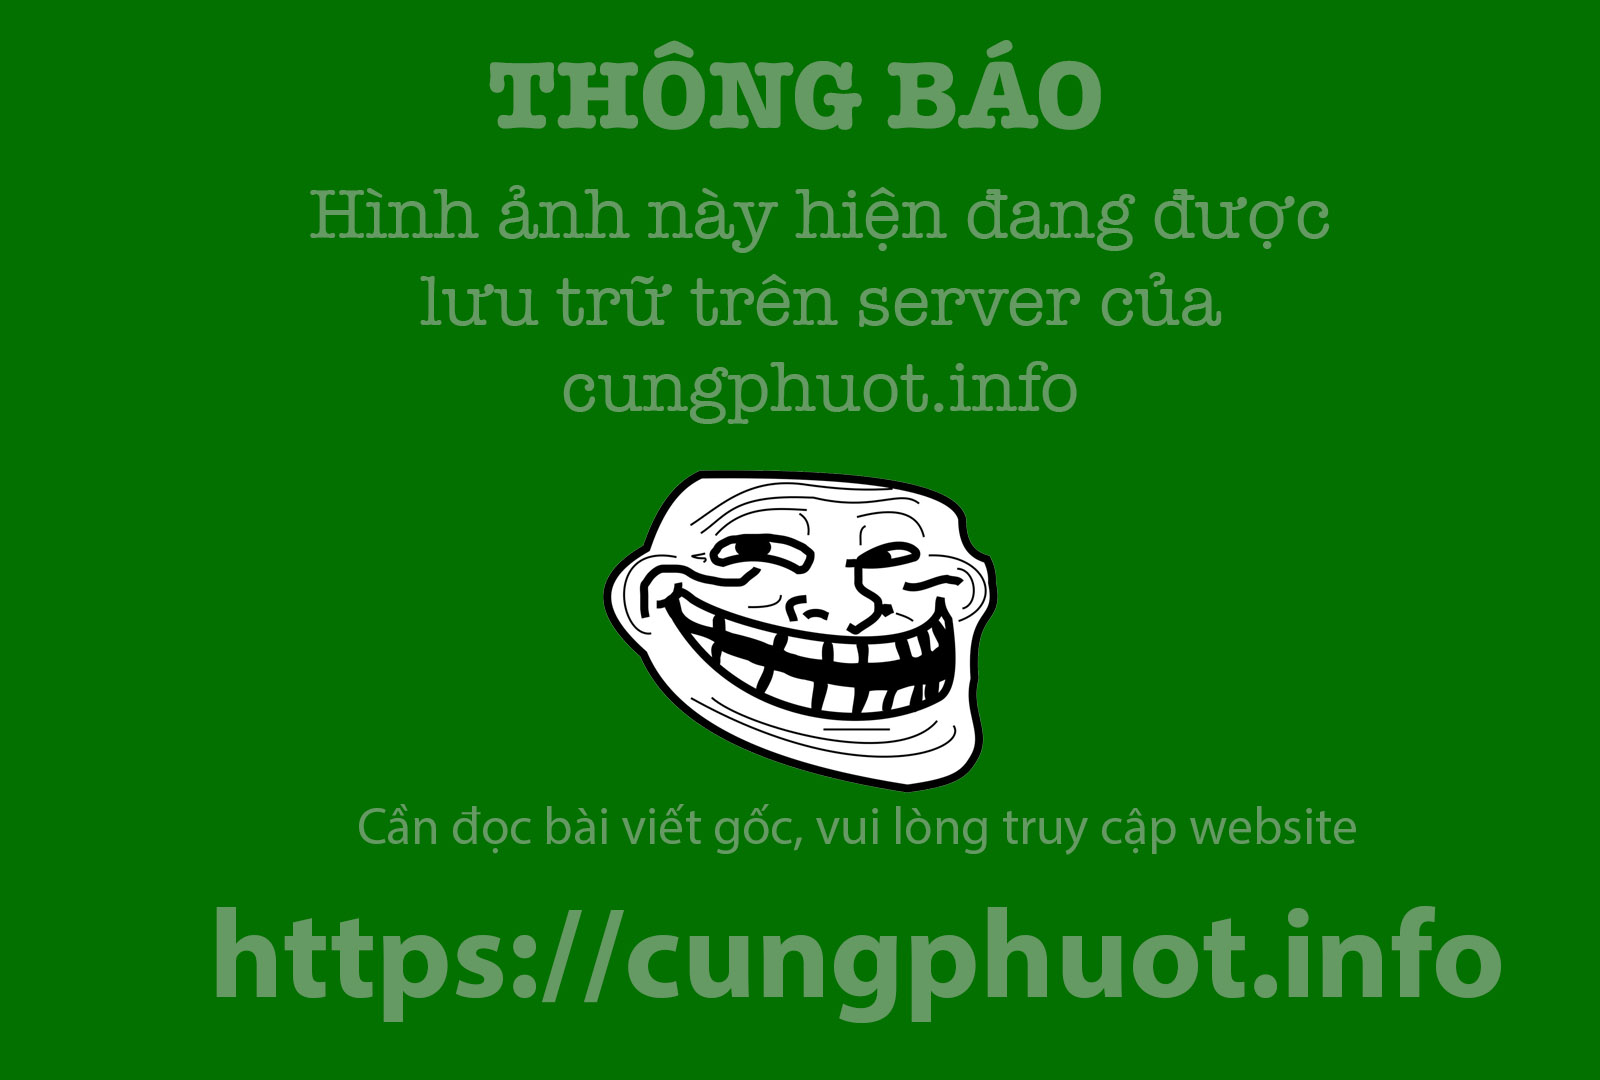 Den Moc Chau san mai anh dao hinh anh 3